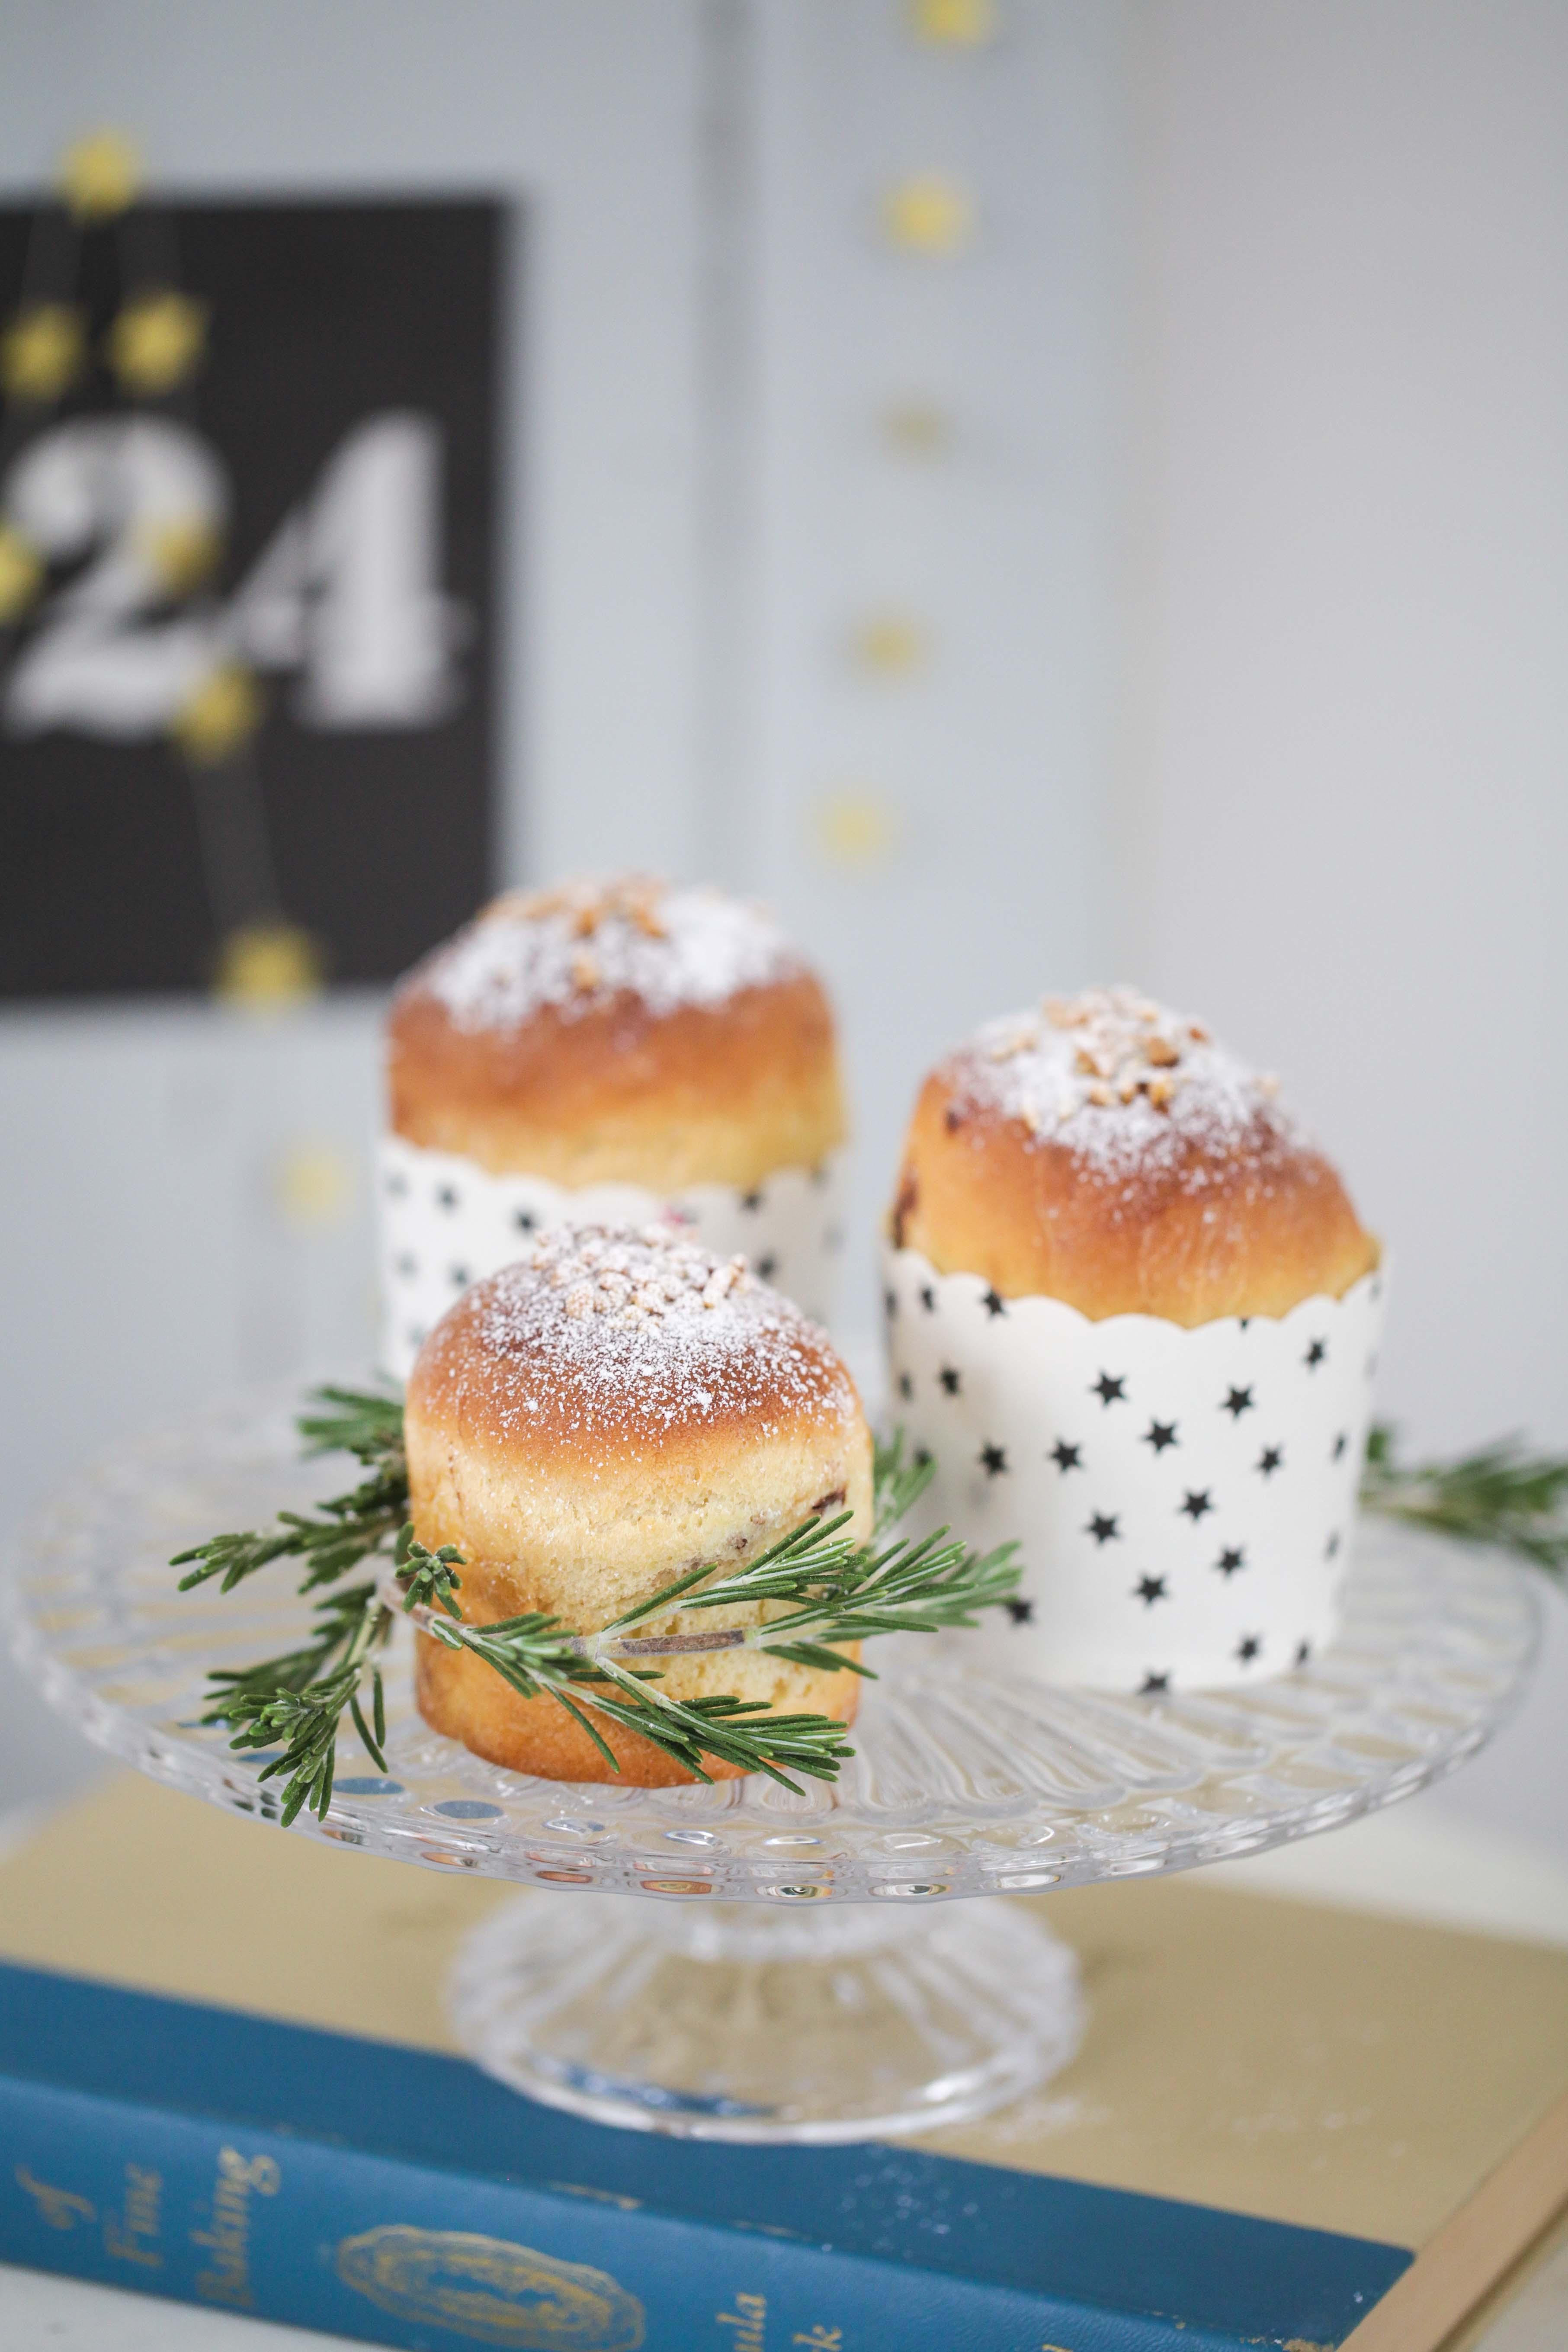 Rezept Panettone Muffins Zuckerzimtundliebe Weihnachtsgebäck Backrezept Backblog